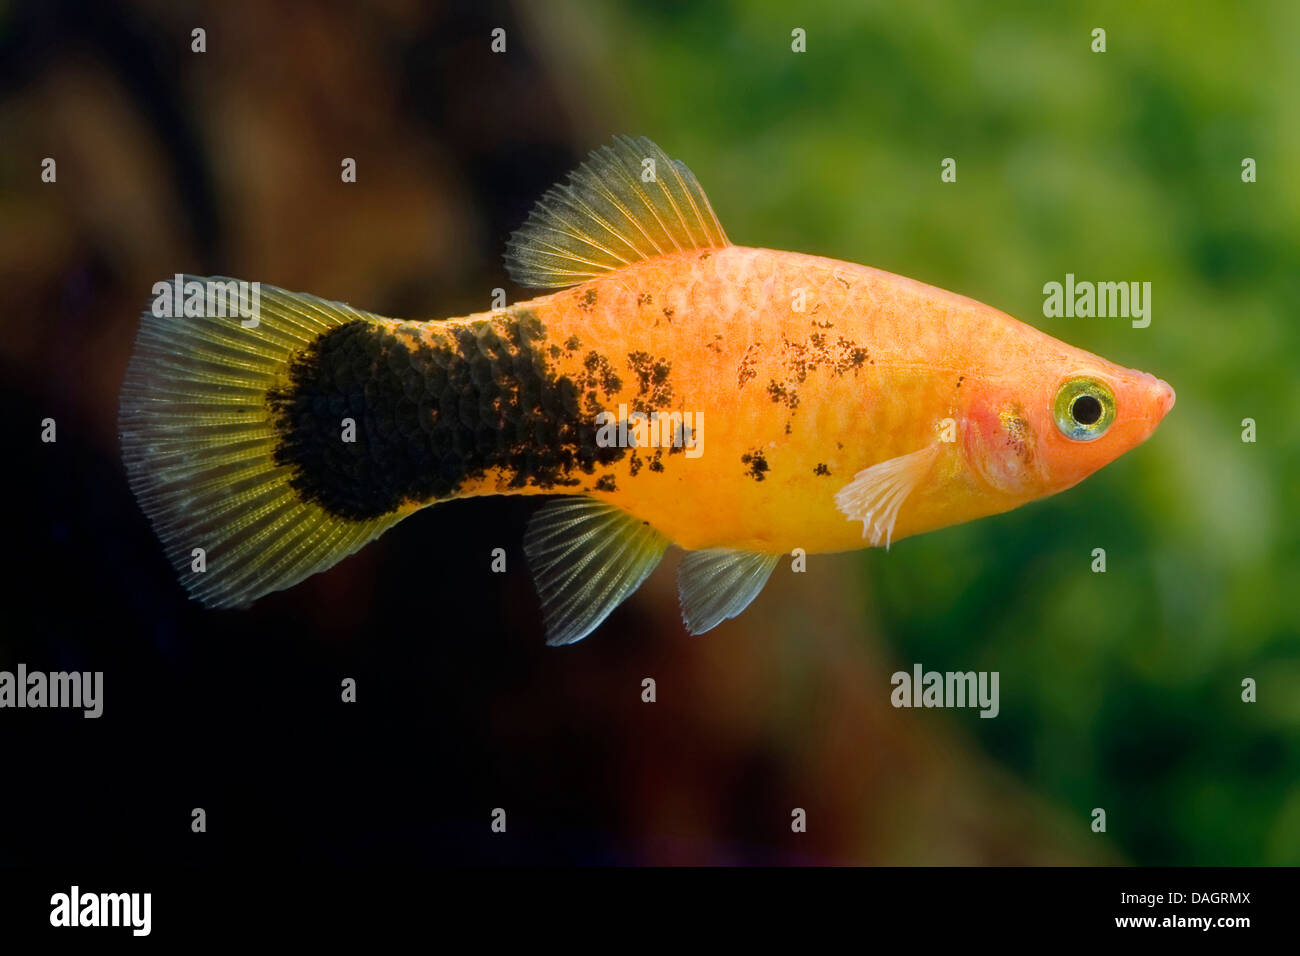 Southern platyfish xiphophorus maculatus breed pepper for Platy fish breeding